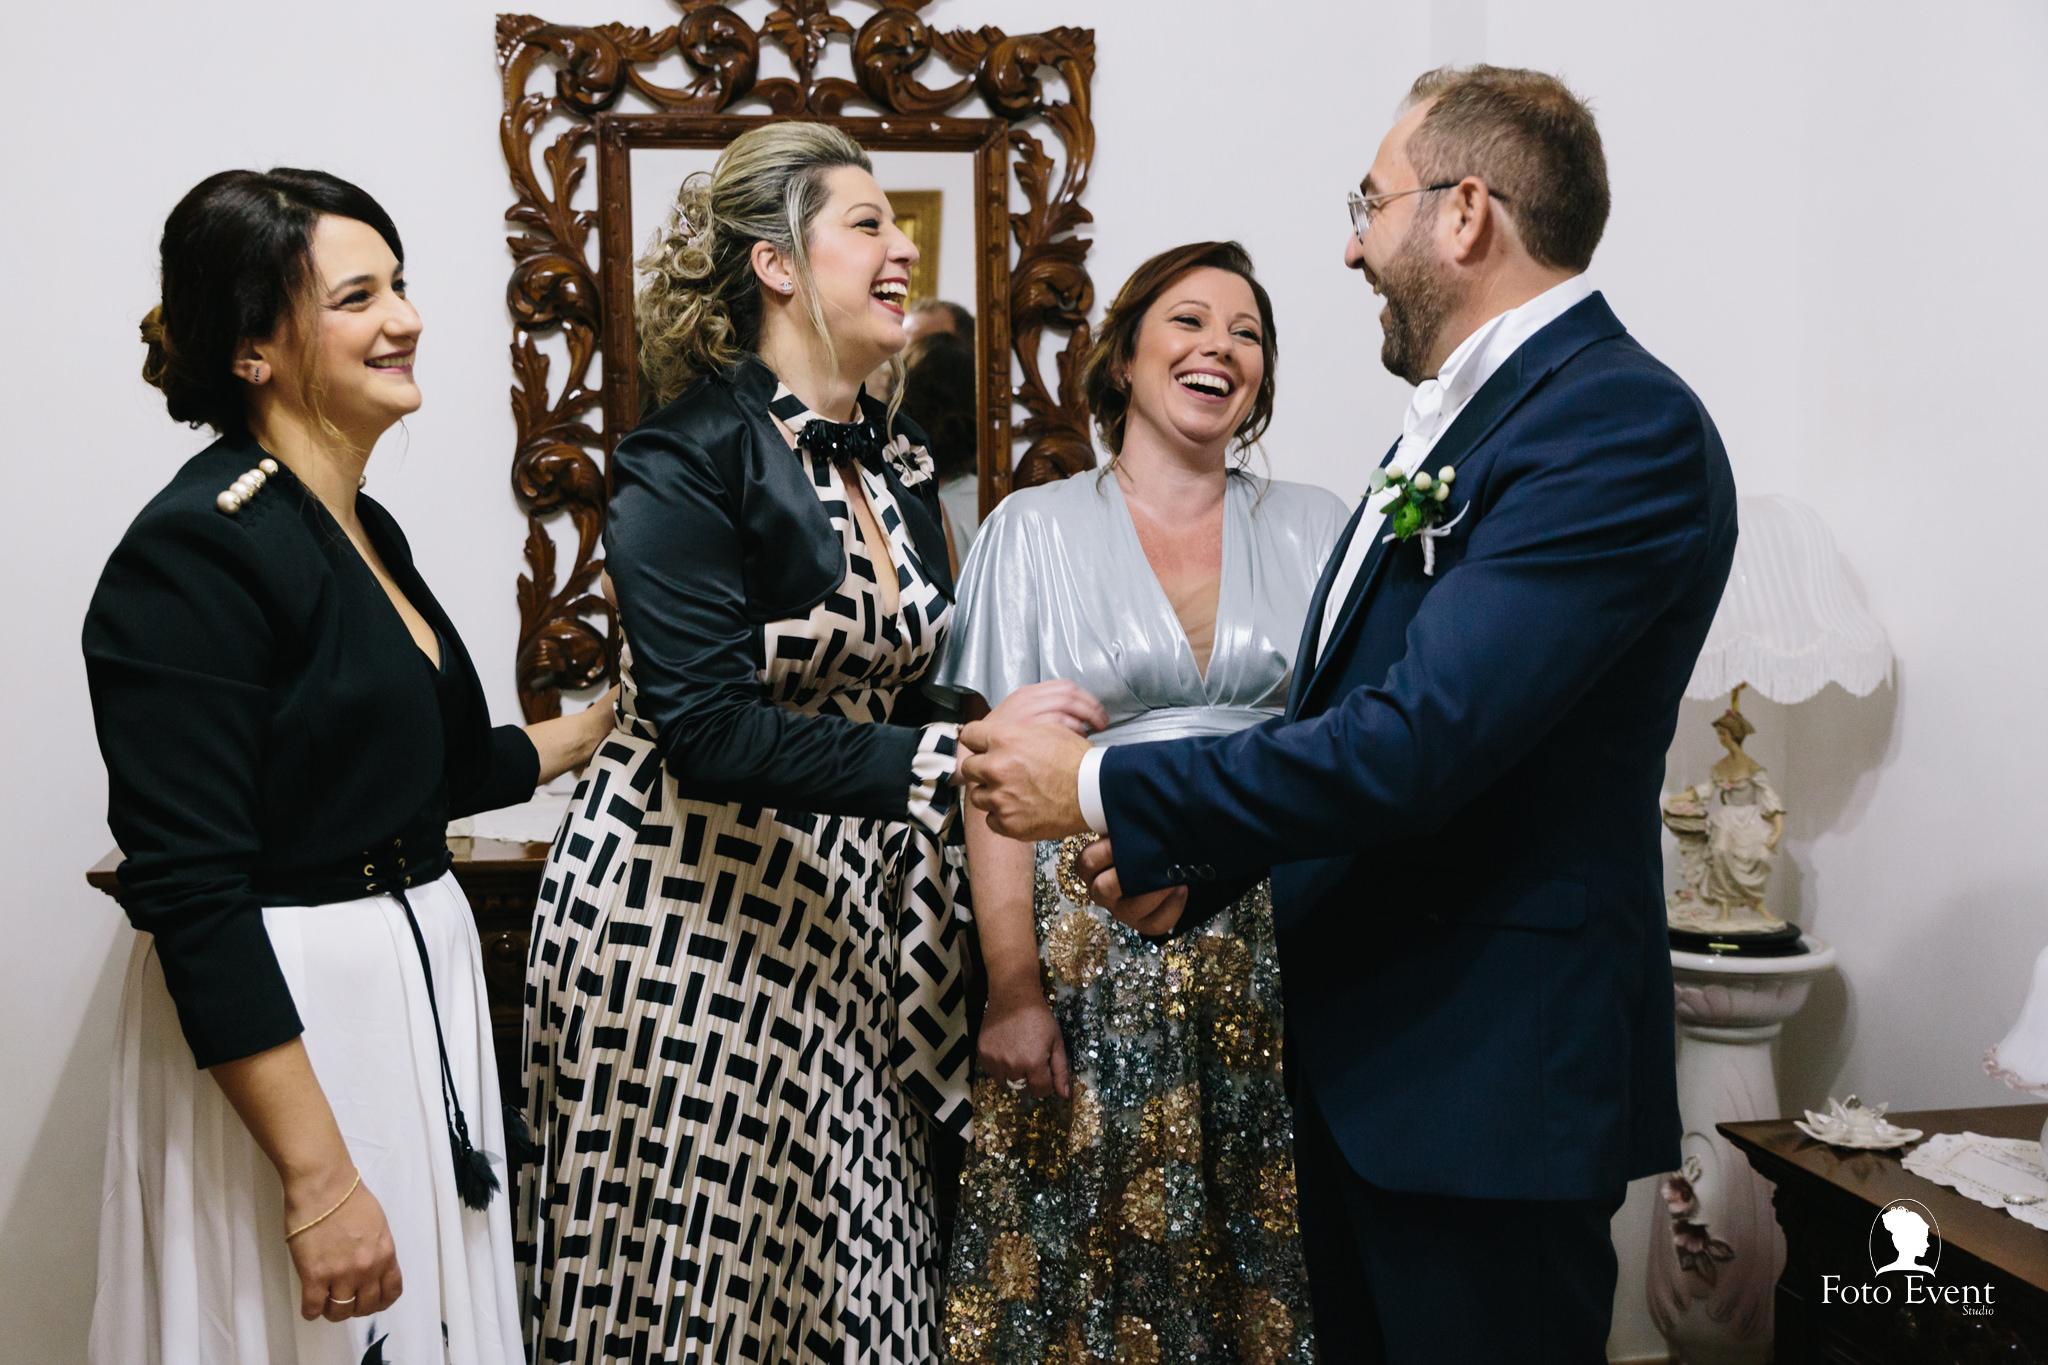 007-2020-10-15-Matrimonio-Noemi-e-Salvatore-Paterno-5DE-228-Edit